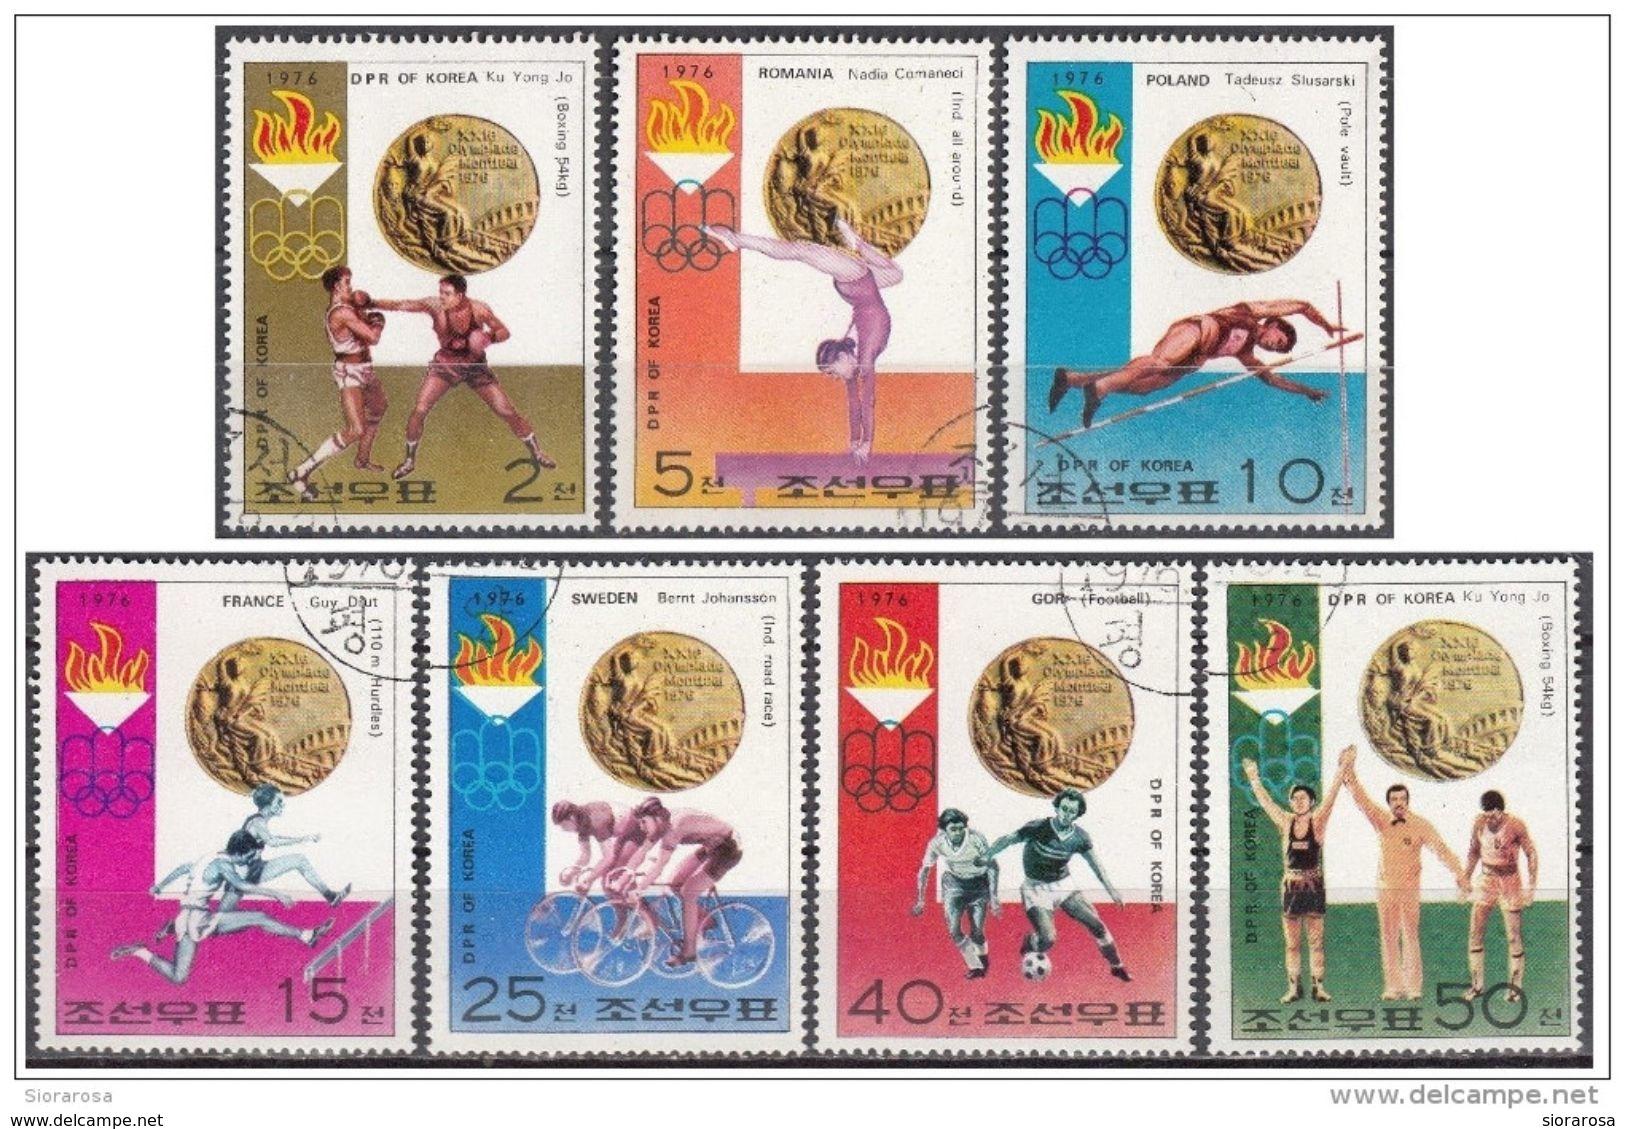 1491 DPR Korea 1976 XXI Olimpiade Montreal Medaglie D ´ Oro Ku Yong Jo, Comaneci, Vault, Slusarski, Drut ...   Gold - Estate 1976: Montreal